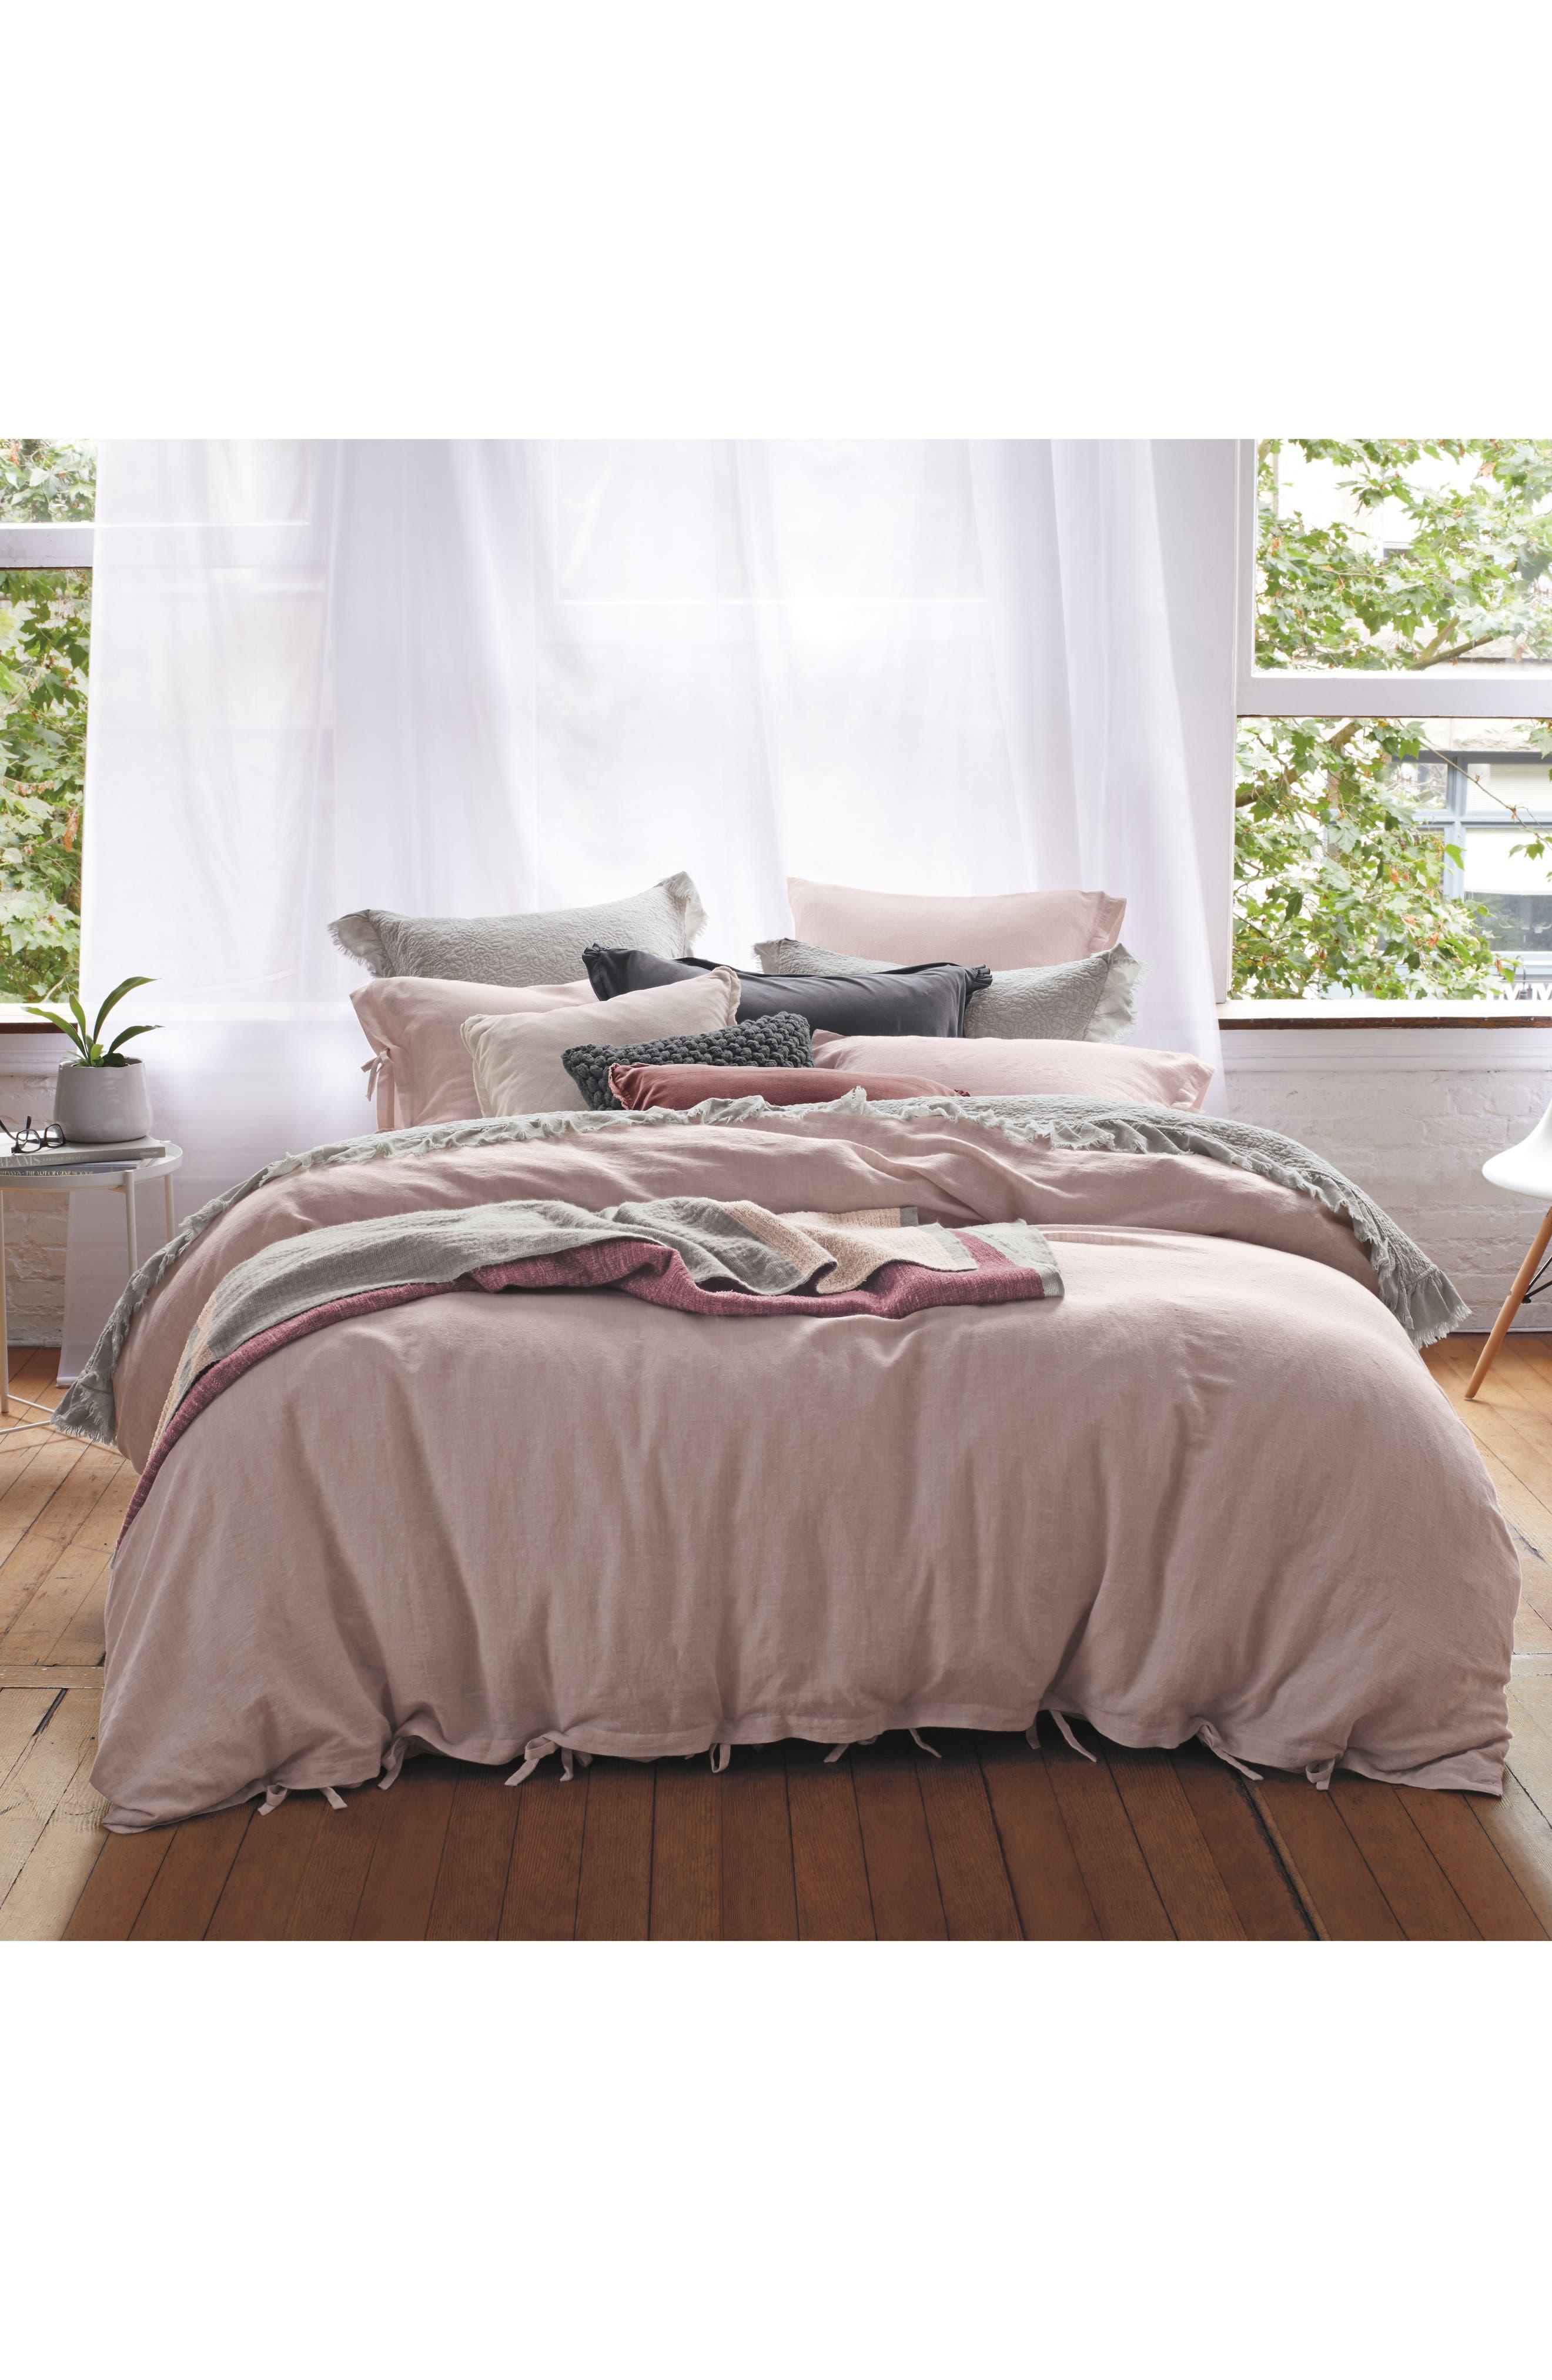 Pebble Knit Accent Pillow,                             Alternate thumbnail 4, color,                             Grey Onyx